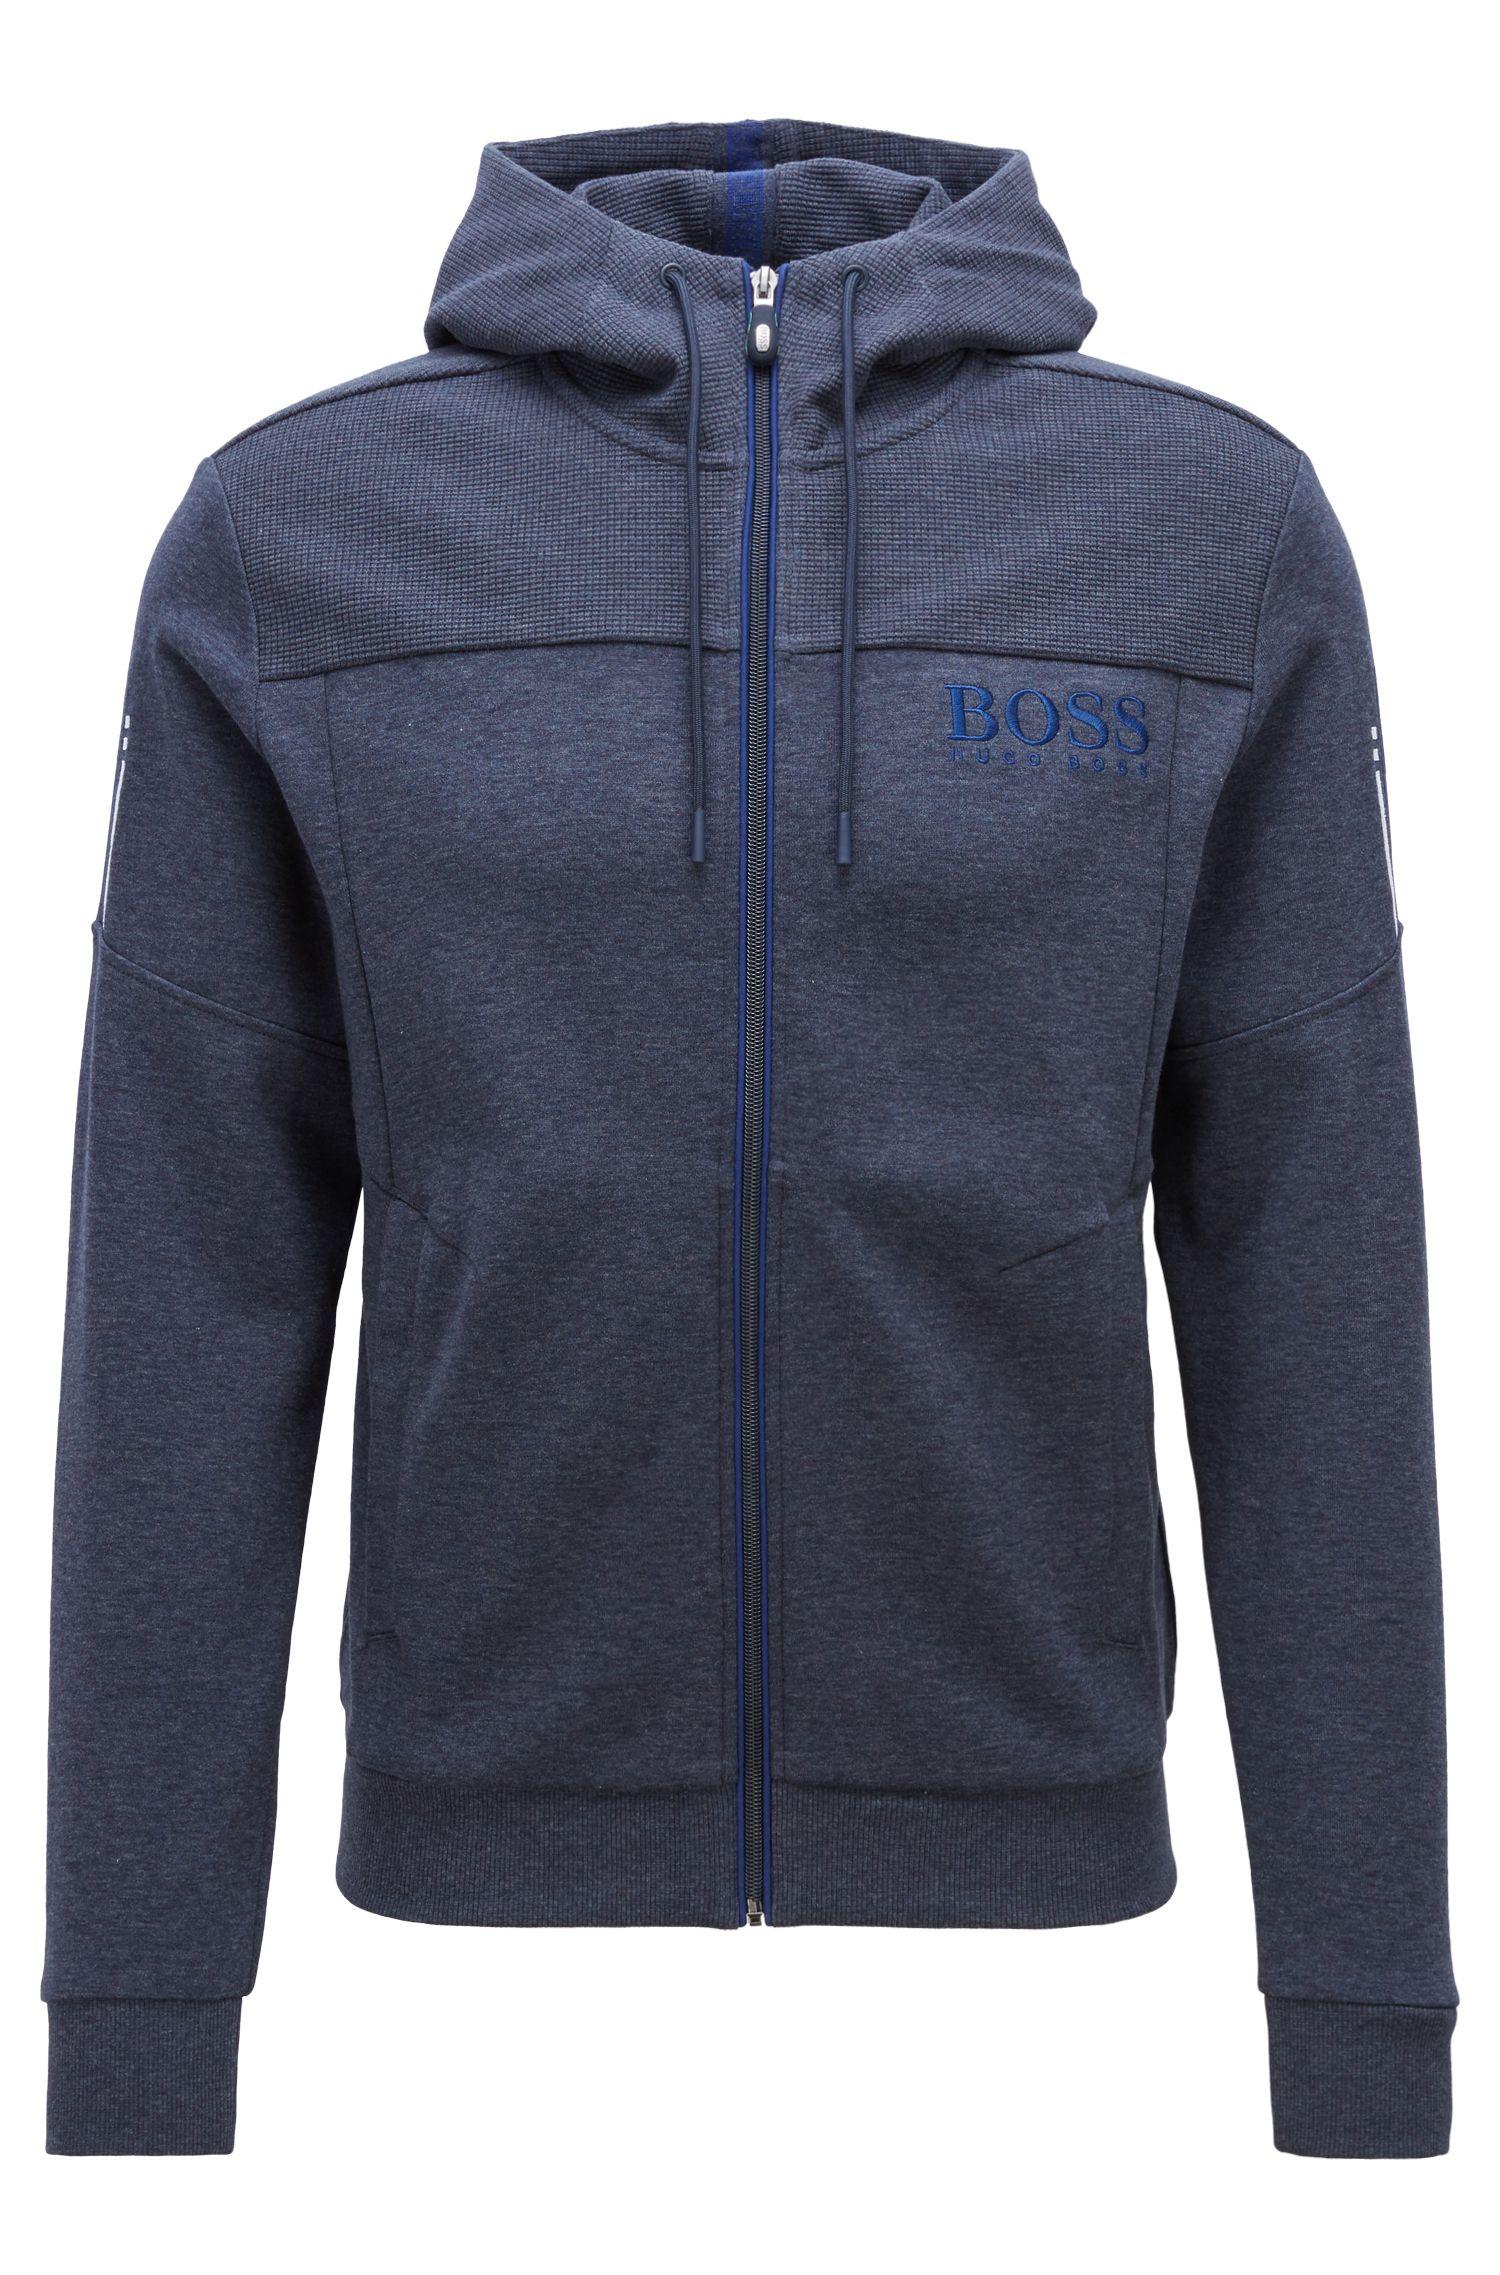 Hooded sweatshirt with contrast zip and logo detail, Dark Blue